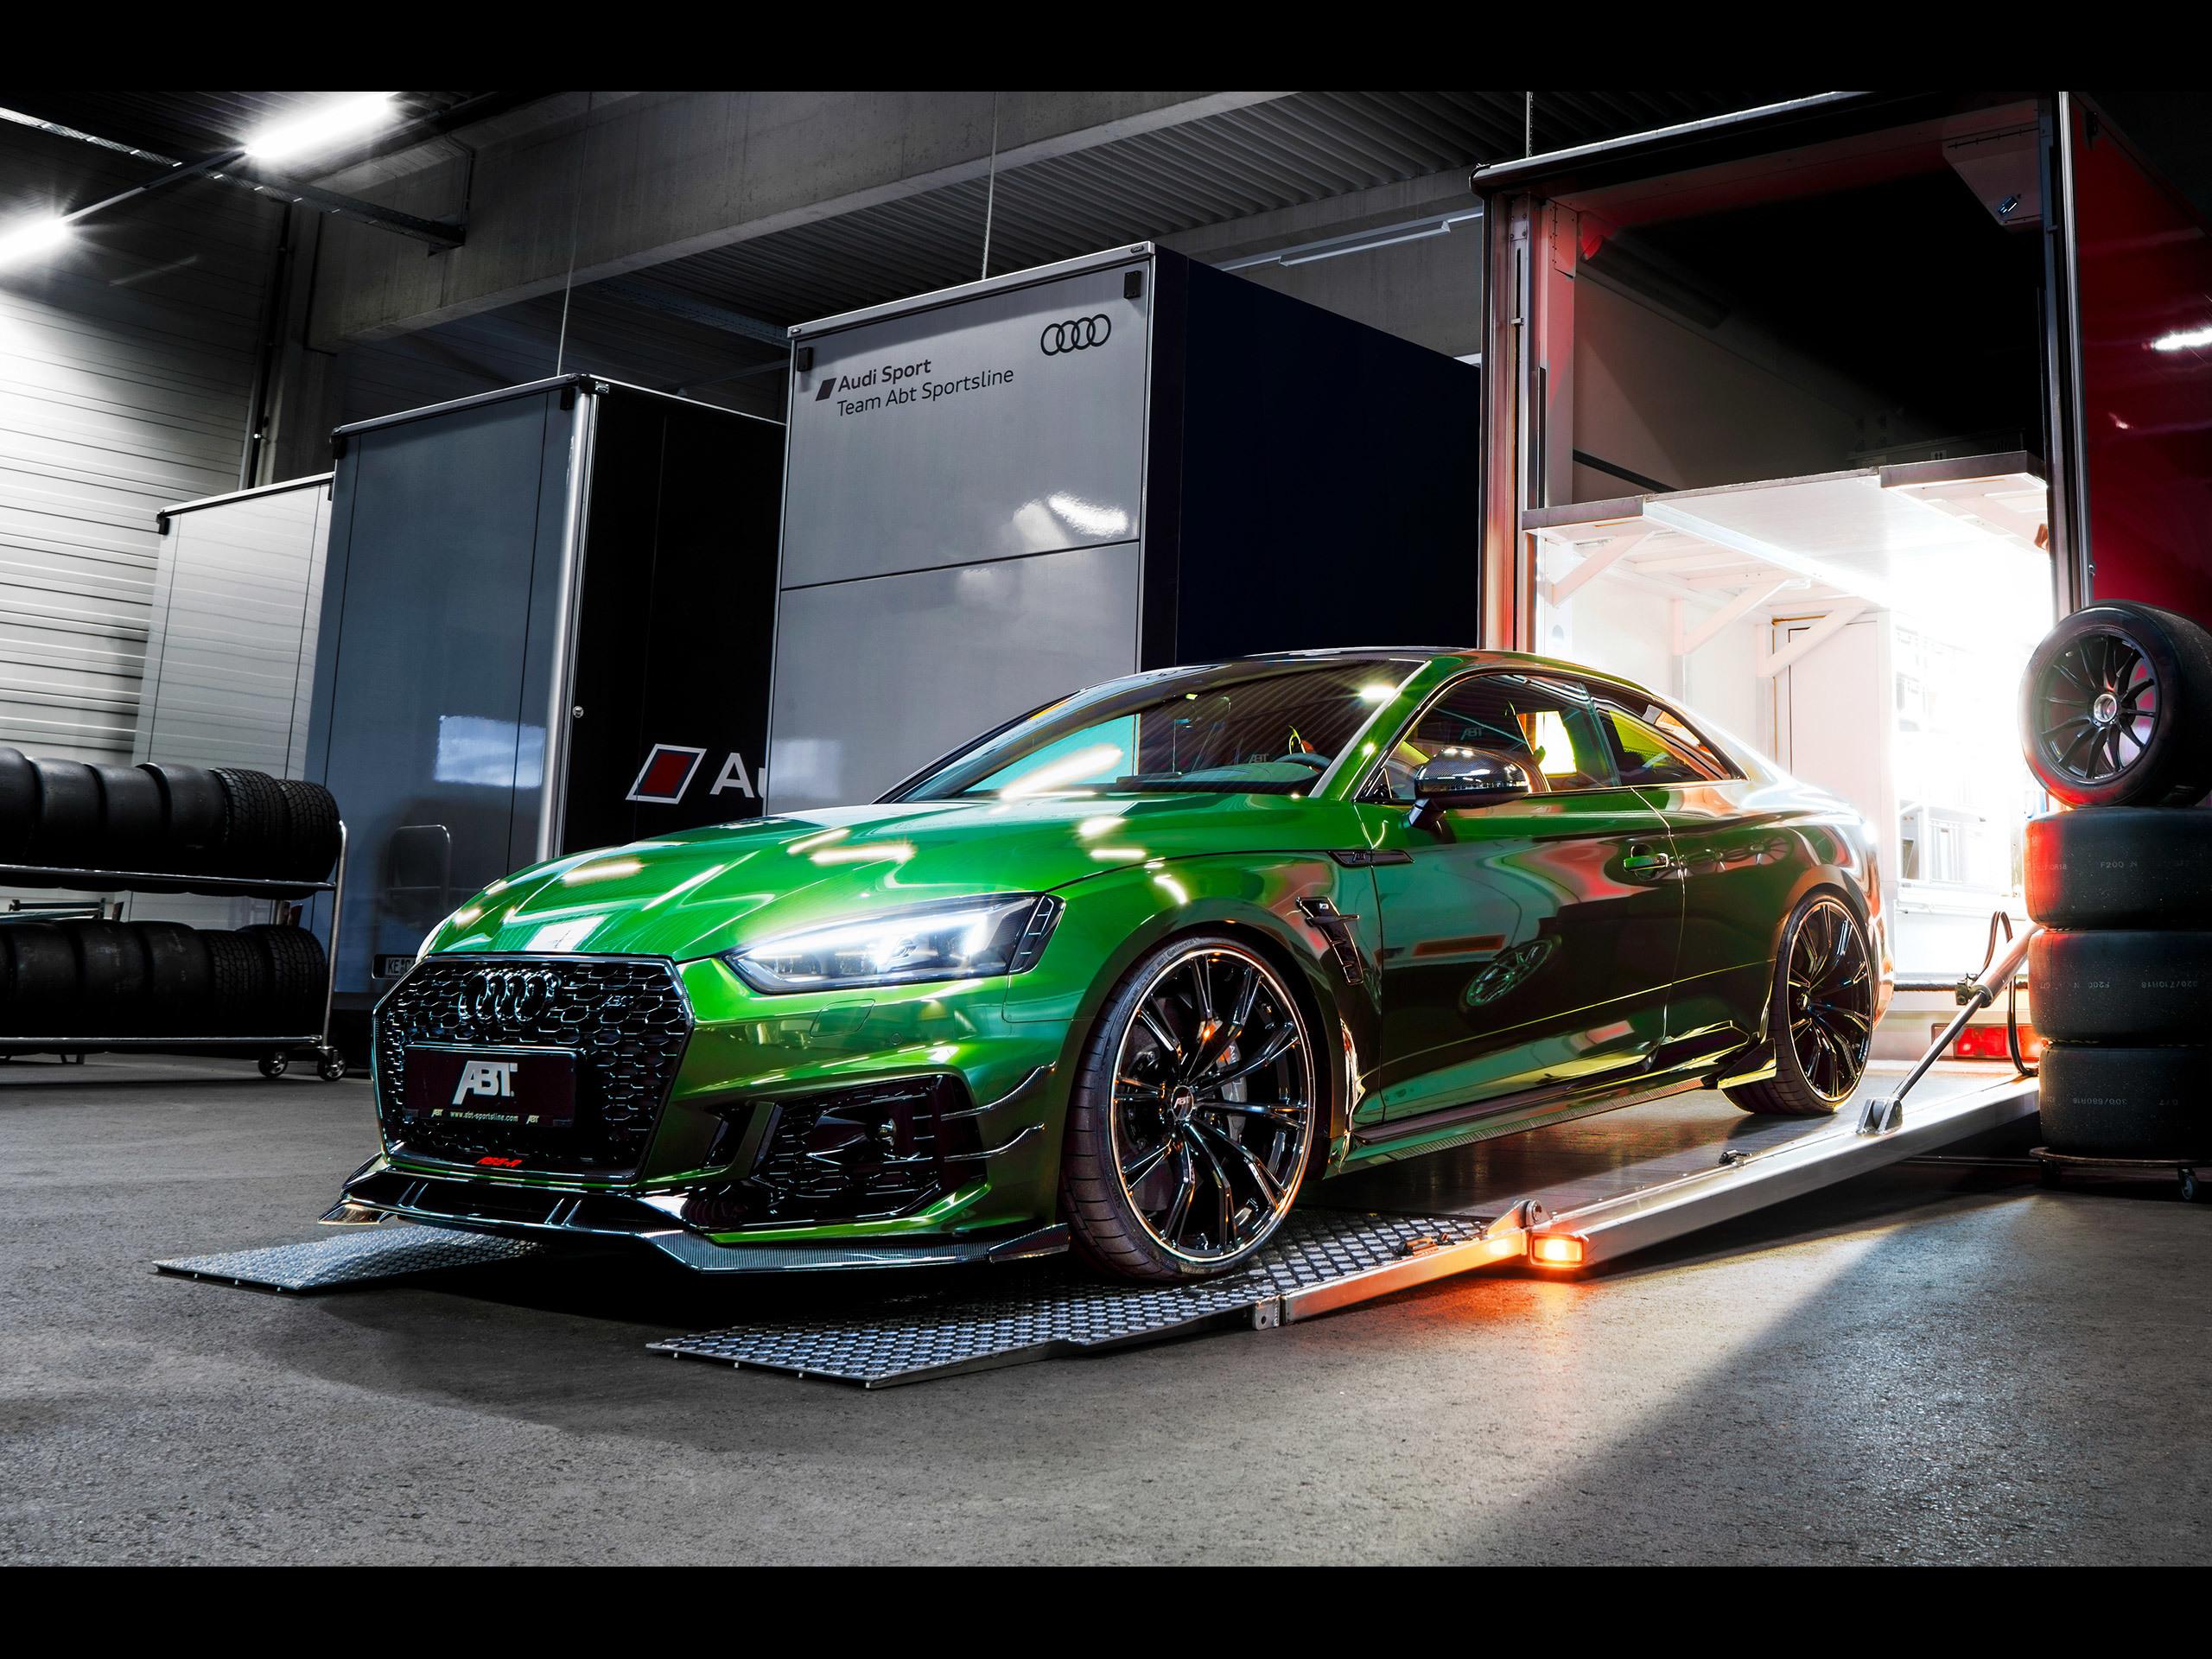 ABT Sportsline Audi RS5R [2018]  アウディに嵌まる  壁紙画像ブログ